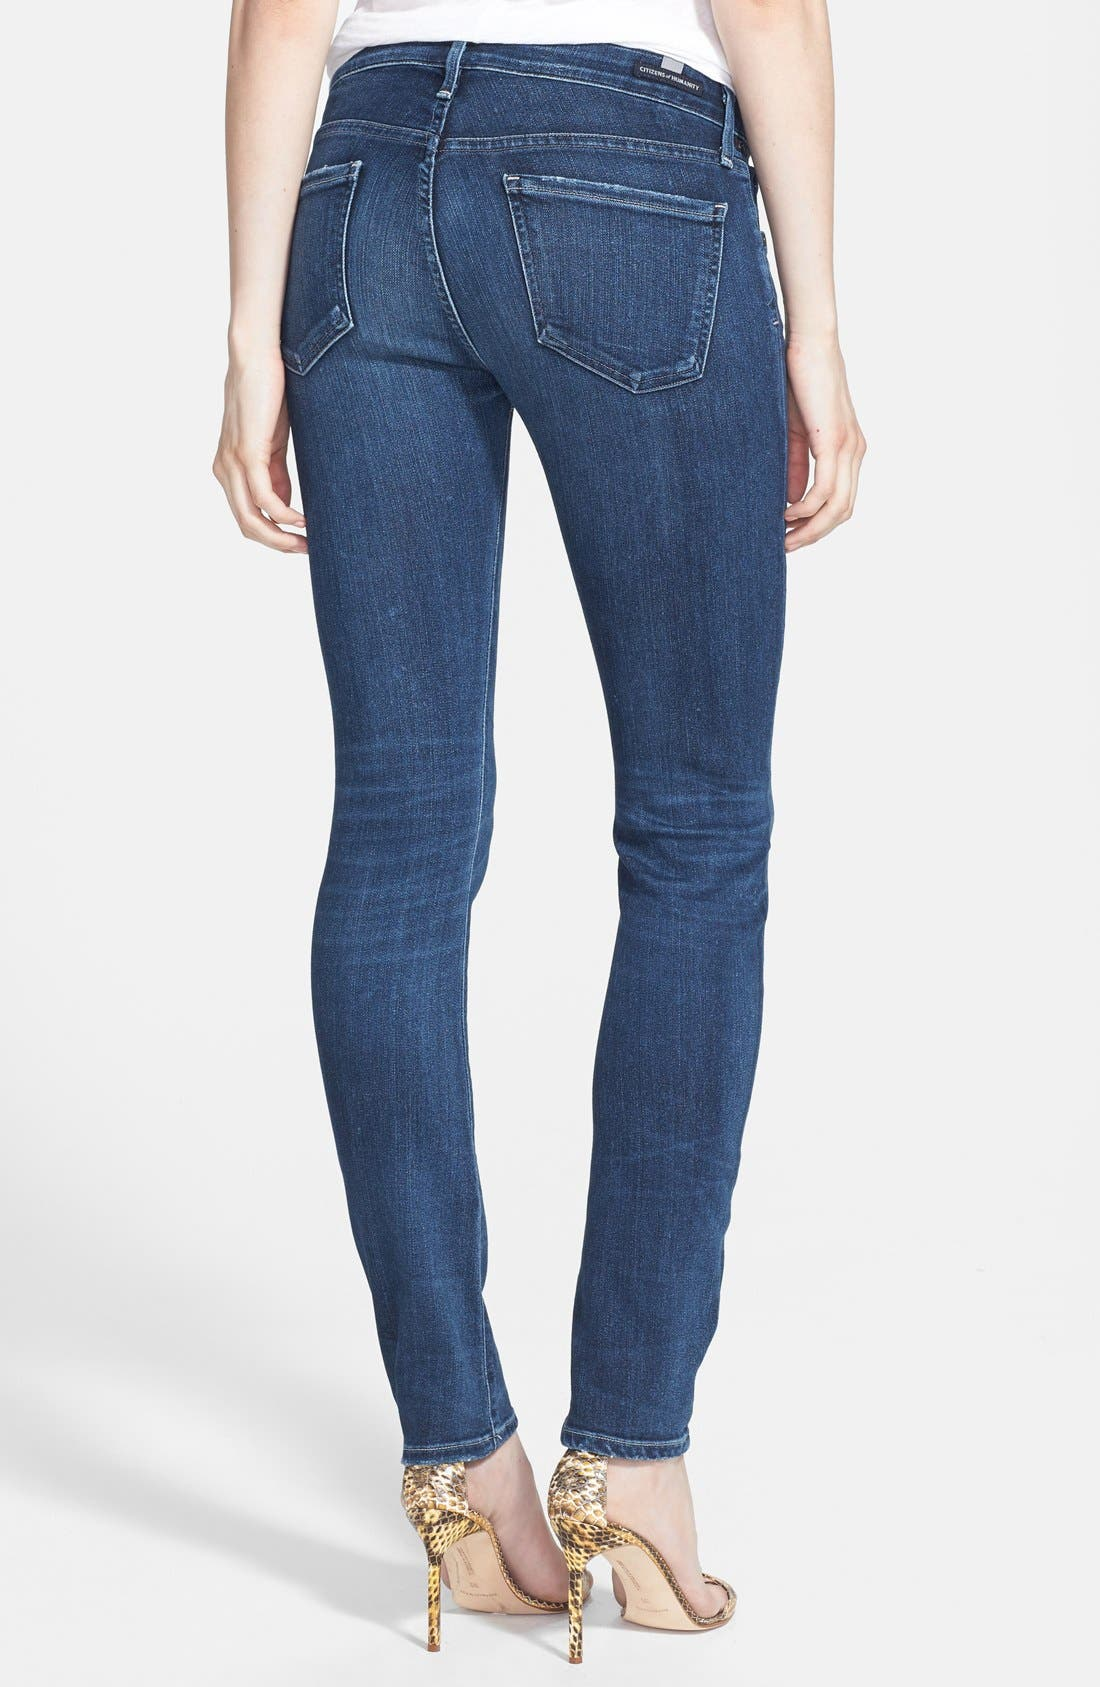 Alternate Image 2  - Citizens of Humanity Arielle Slim Jeans (Hewett)